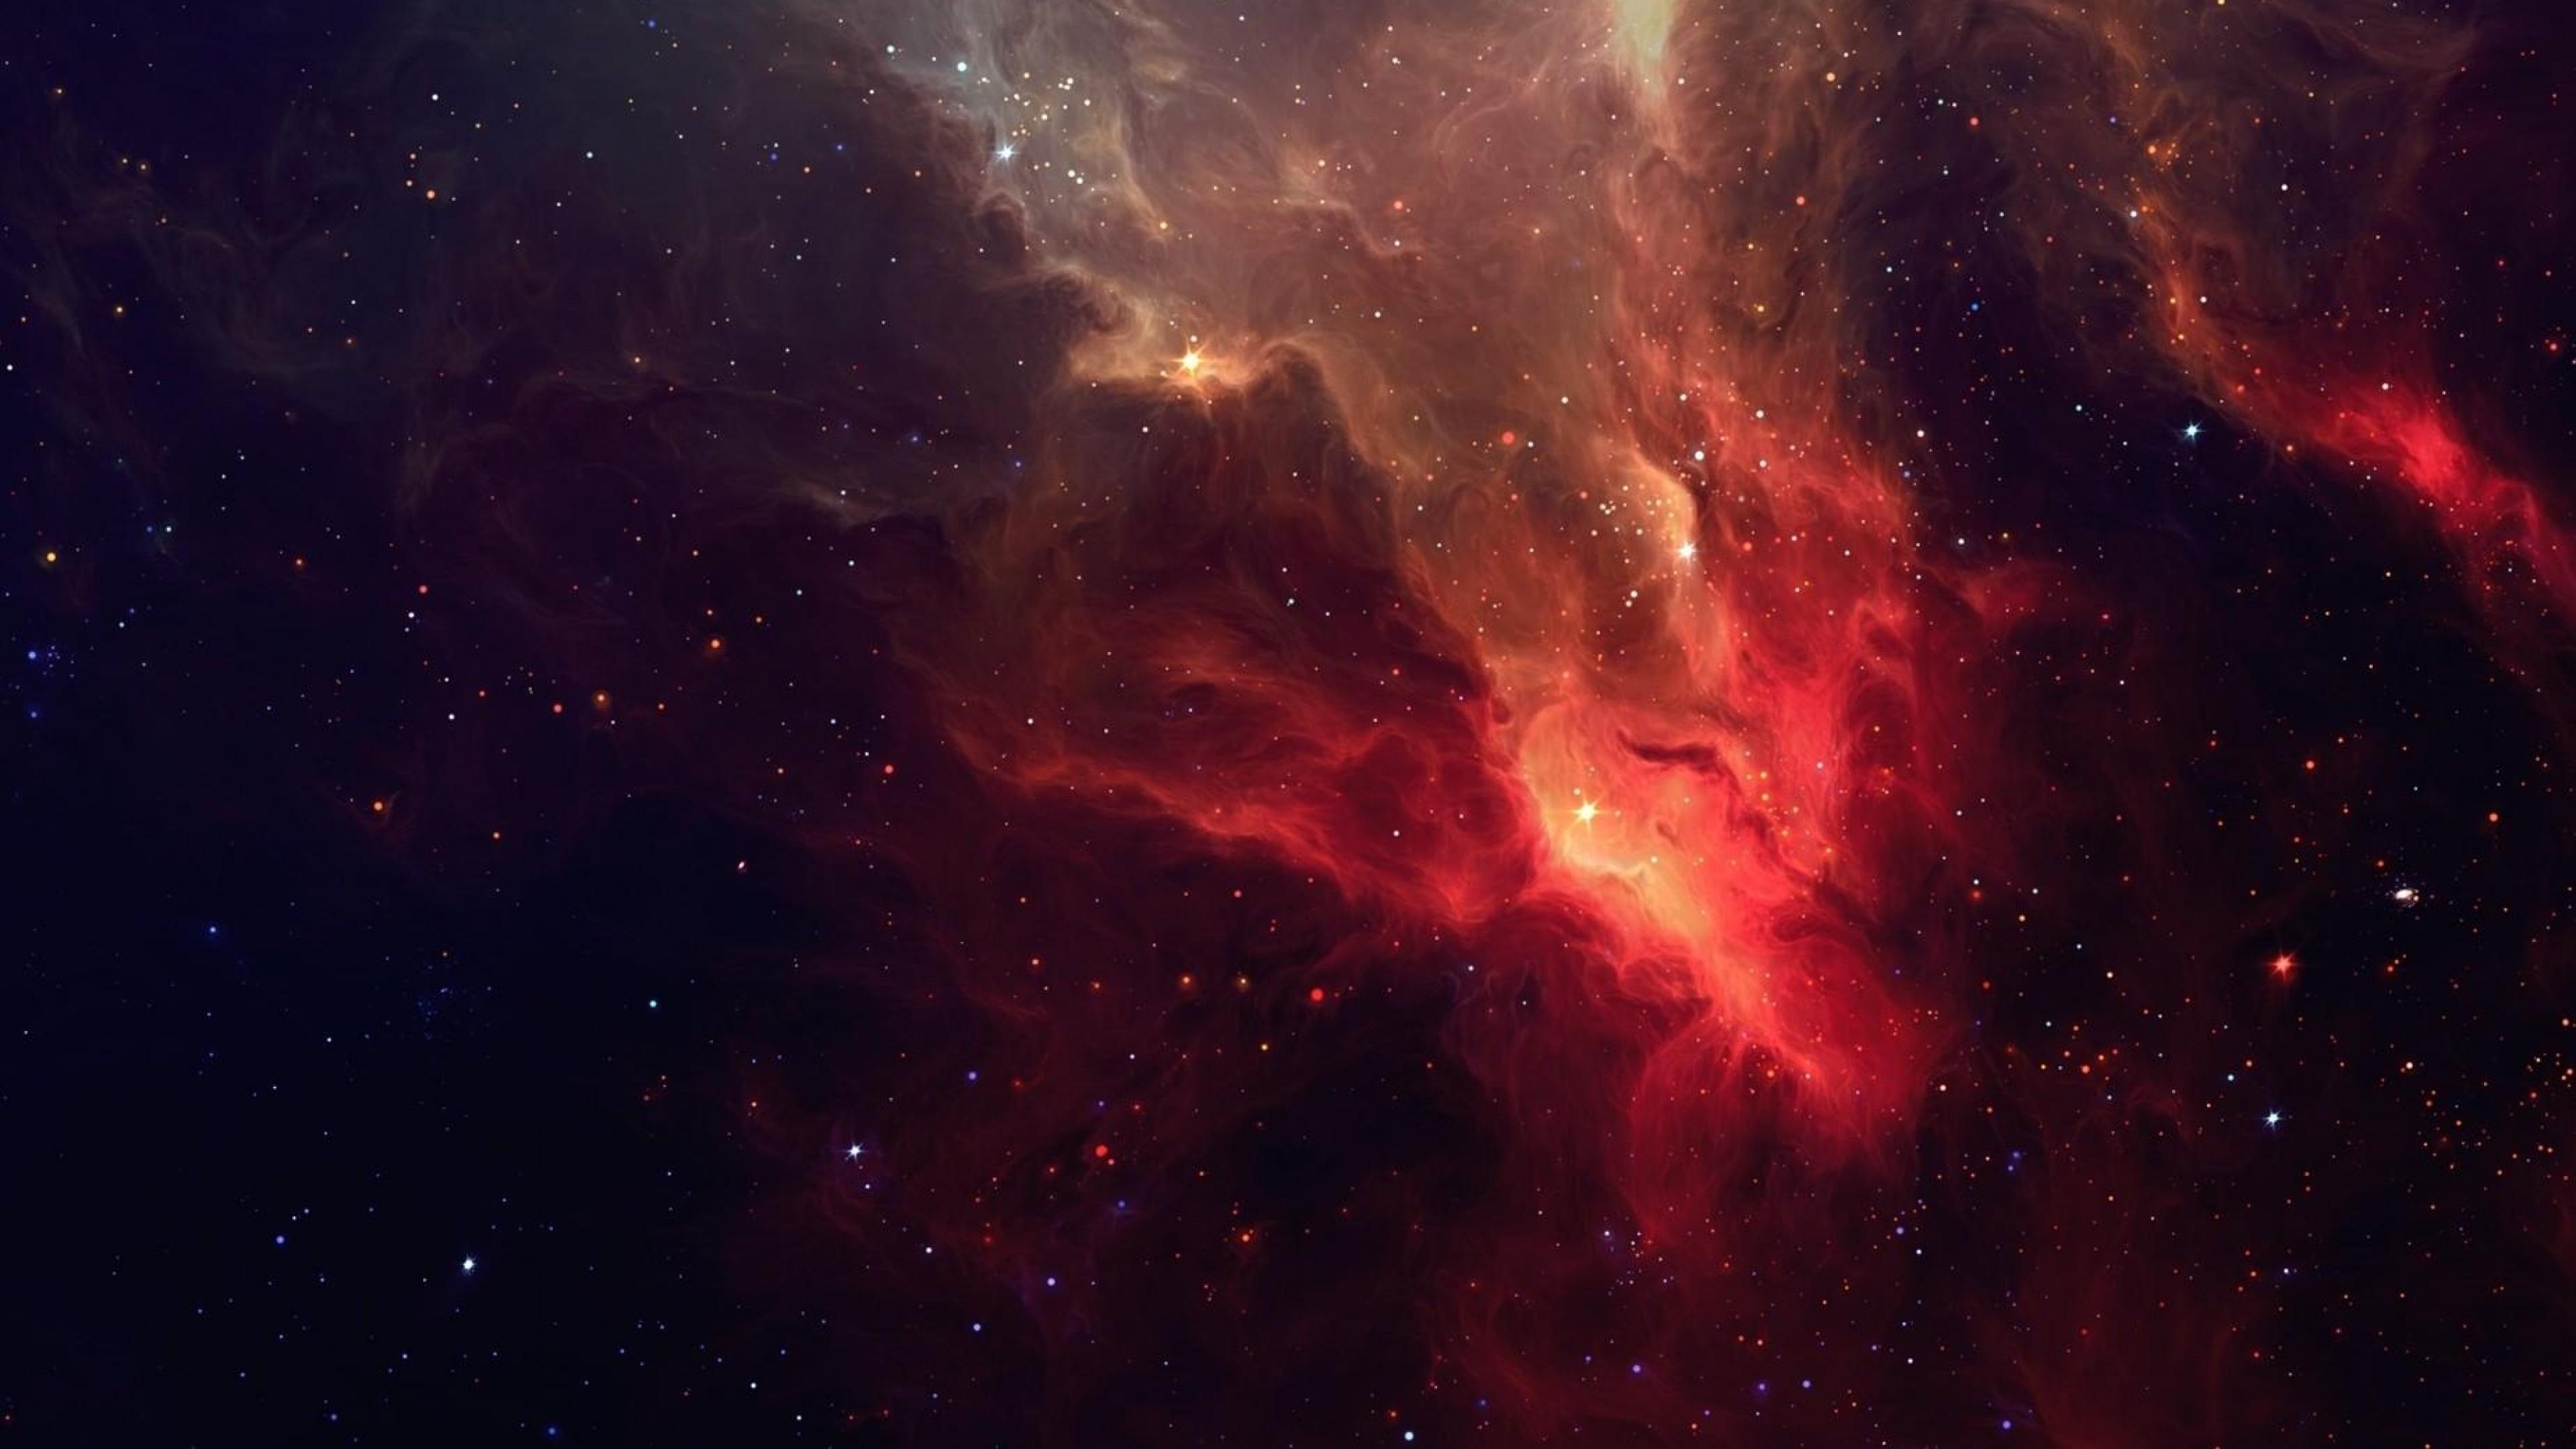 Galaxia Nebula tonos Rojos 4k